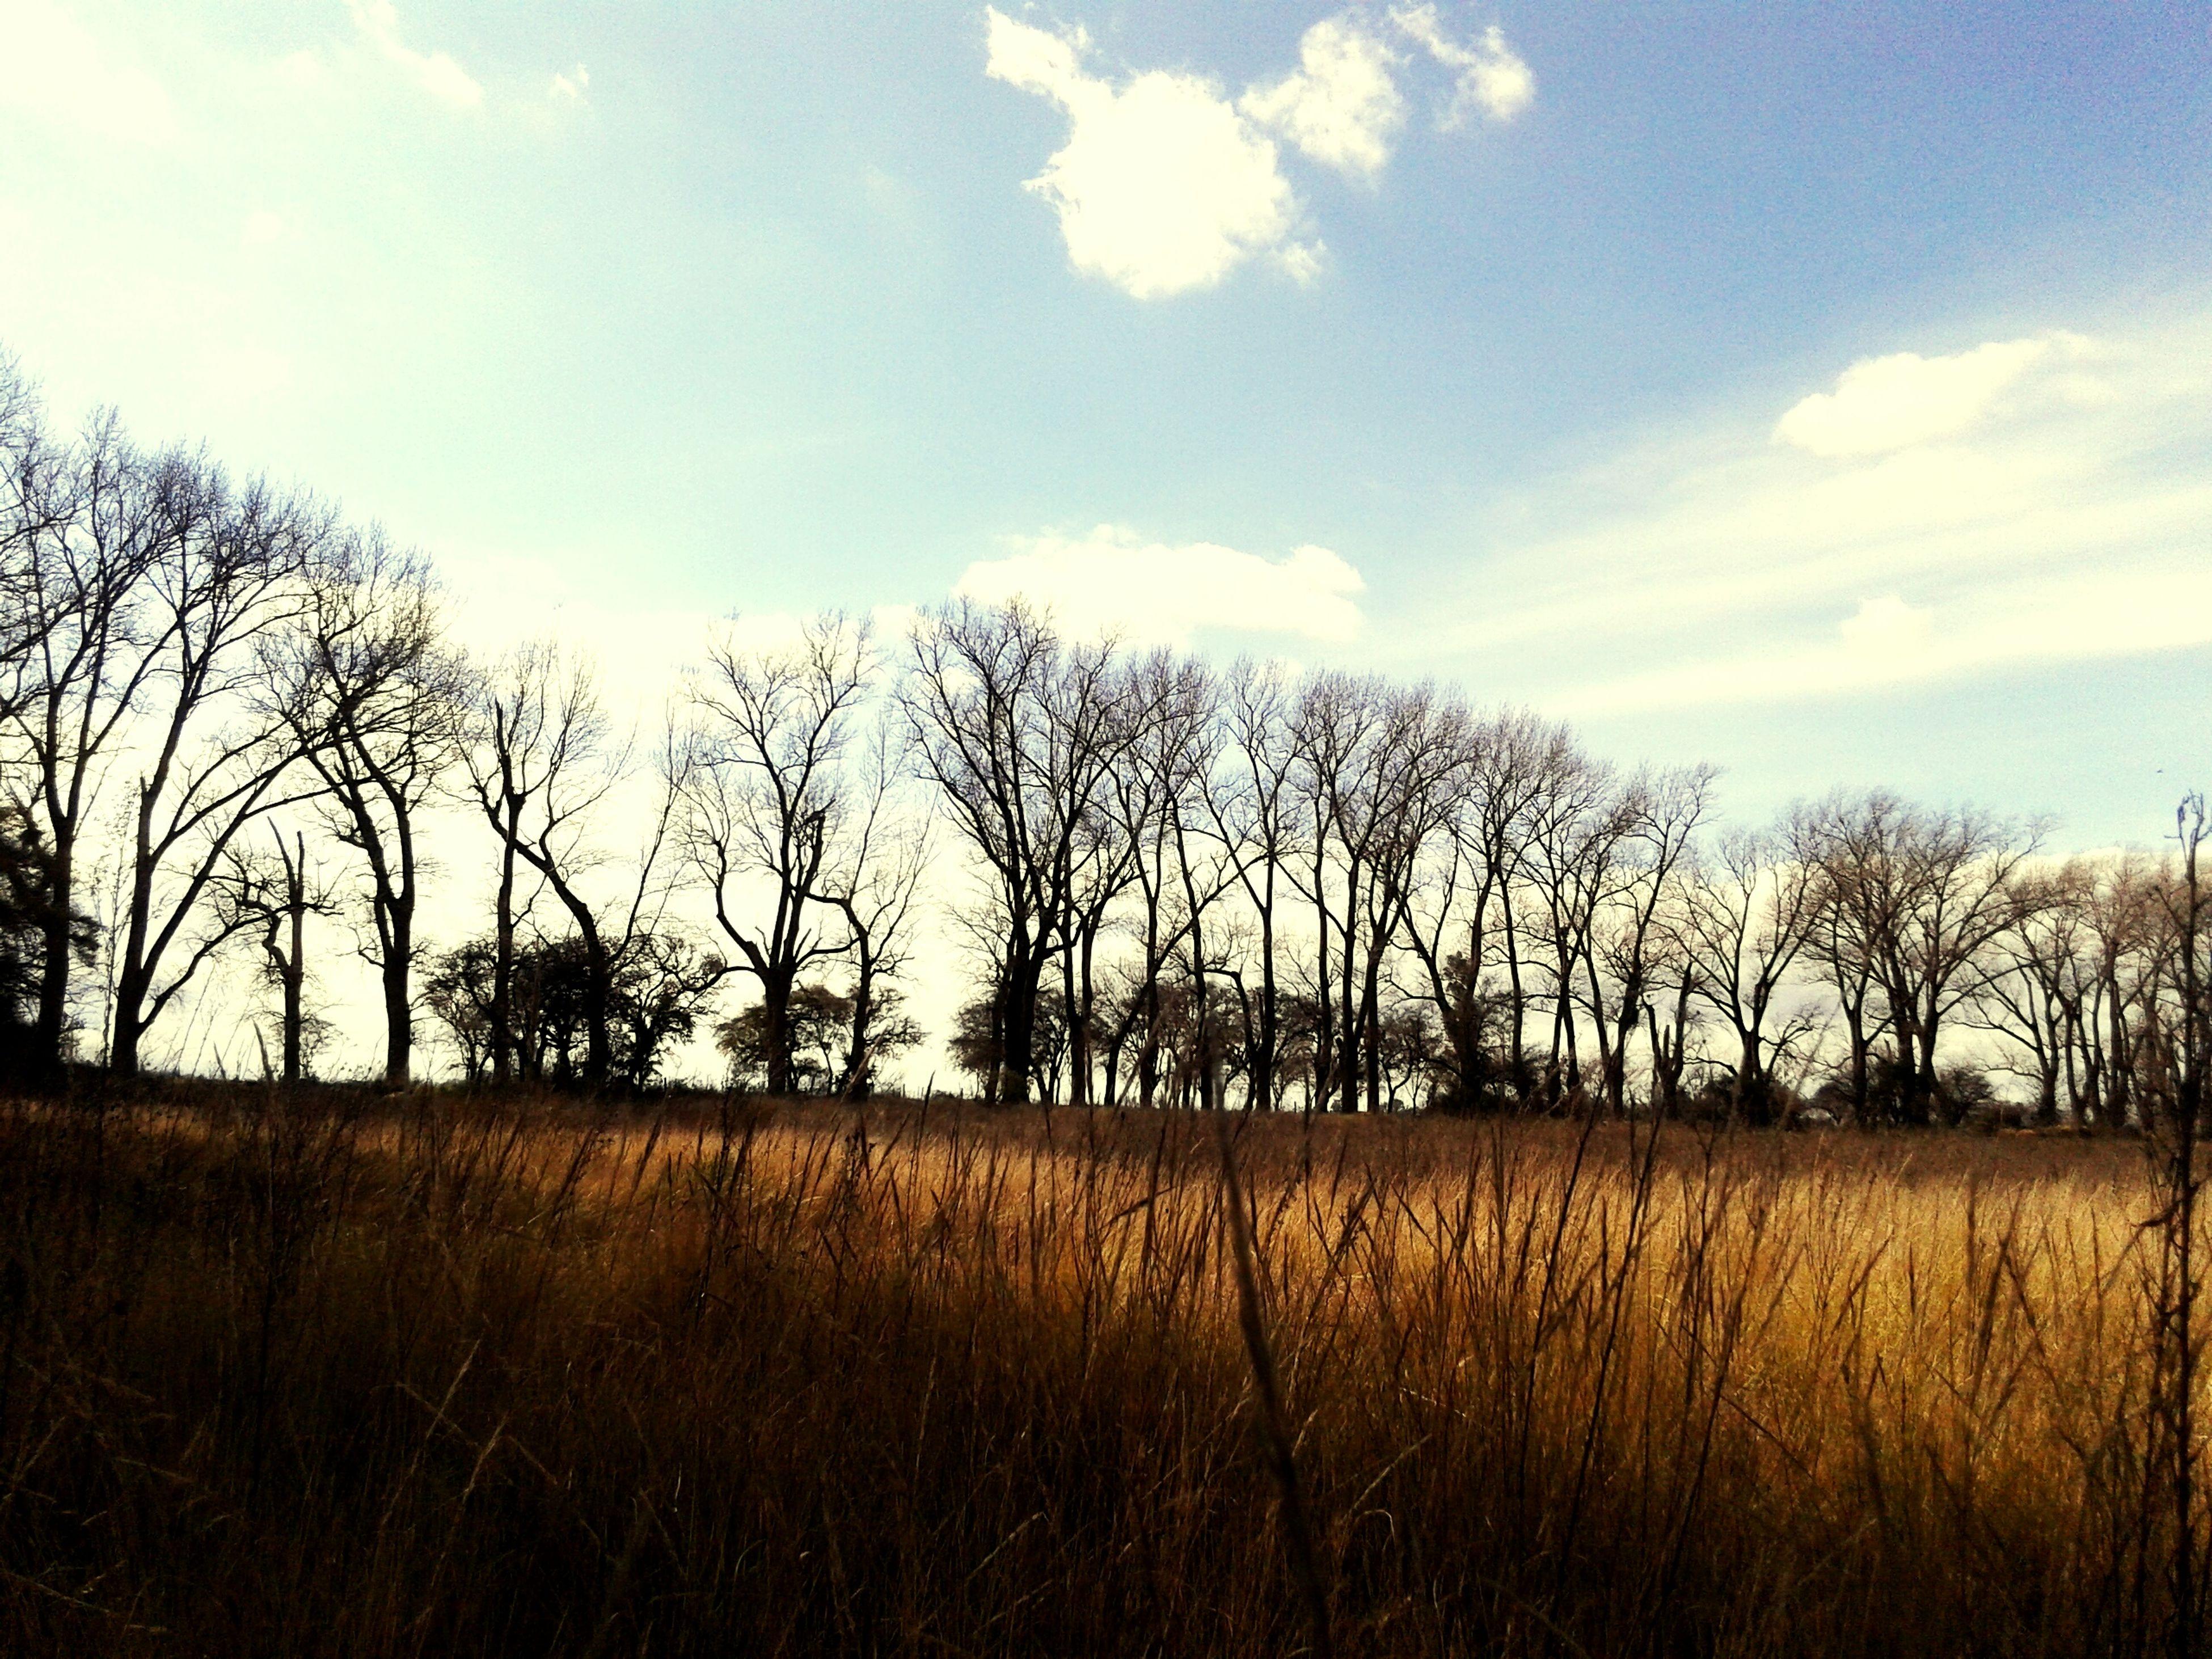 field, bare tree, sky, tree, landscape, tranquility, tranquil scene, rural scene, grass, scenics, nature, beauty in nature, growth, cloud - sky, cloud, horizon over land, blue, non-urban scene, grassy, no people, outdoors, remote, idyllic, day, non urban scene